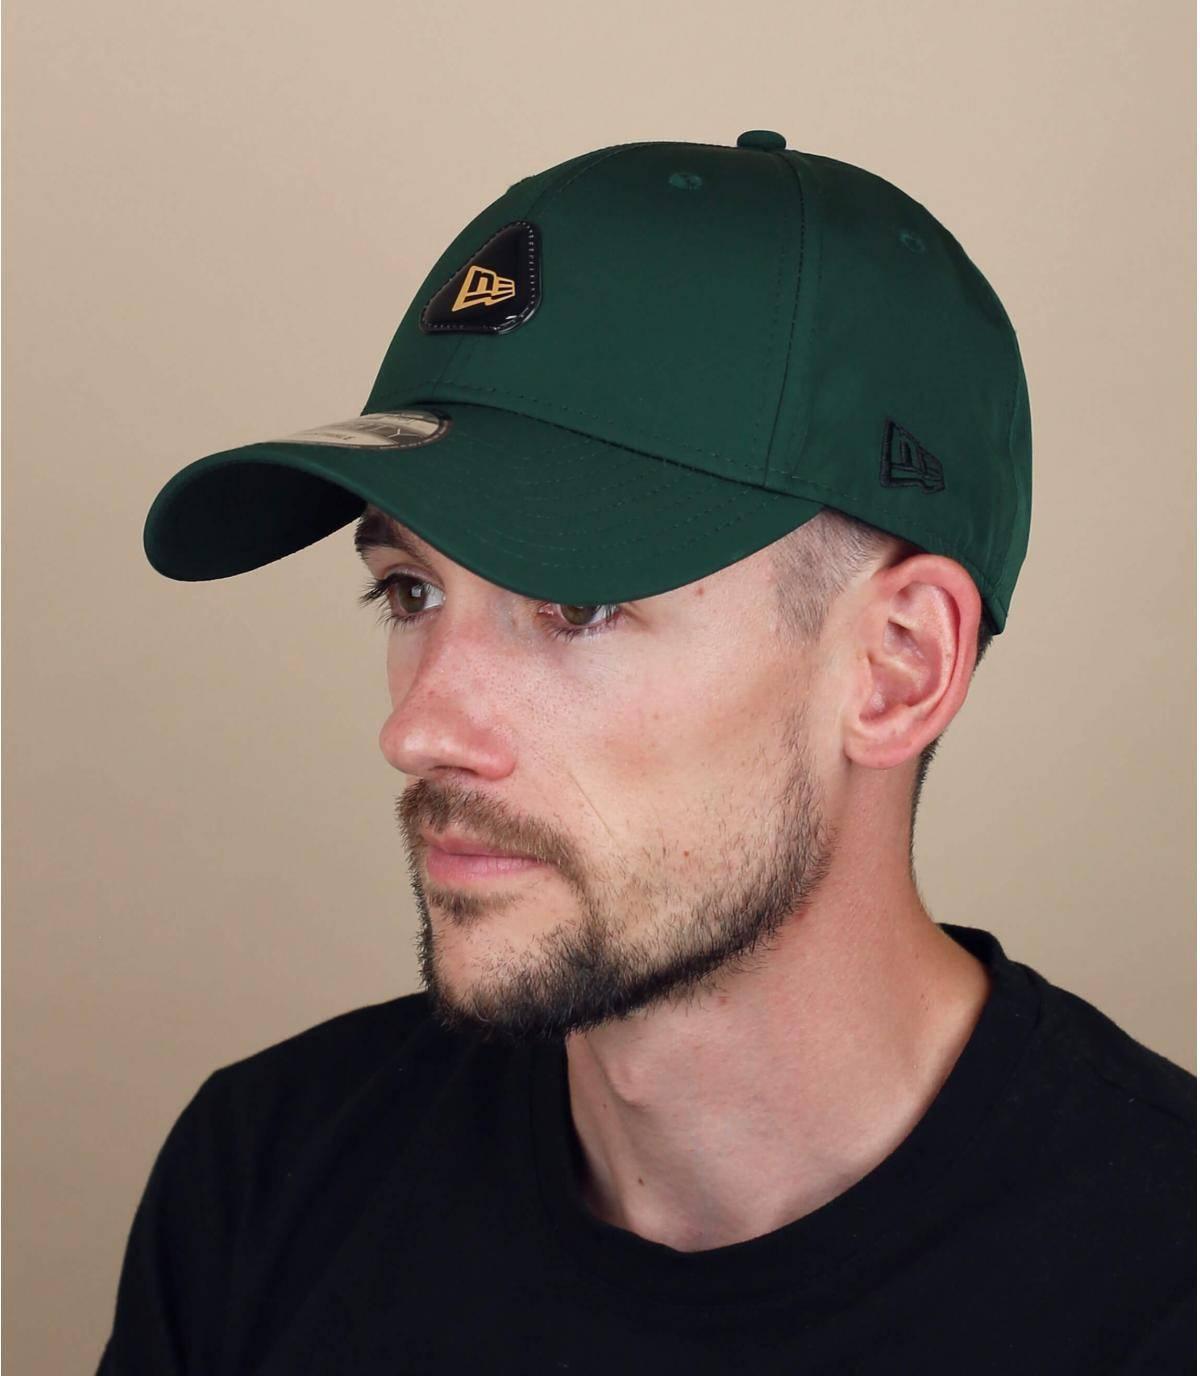 casquette New Era vert